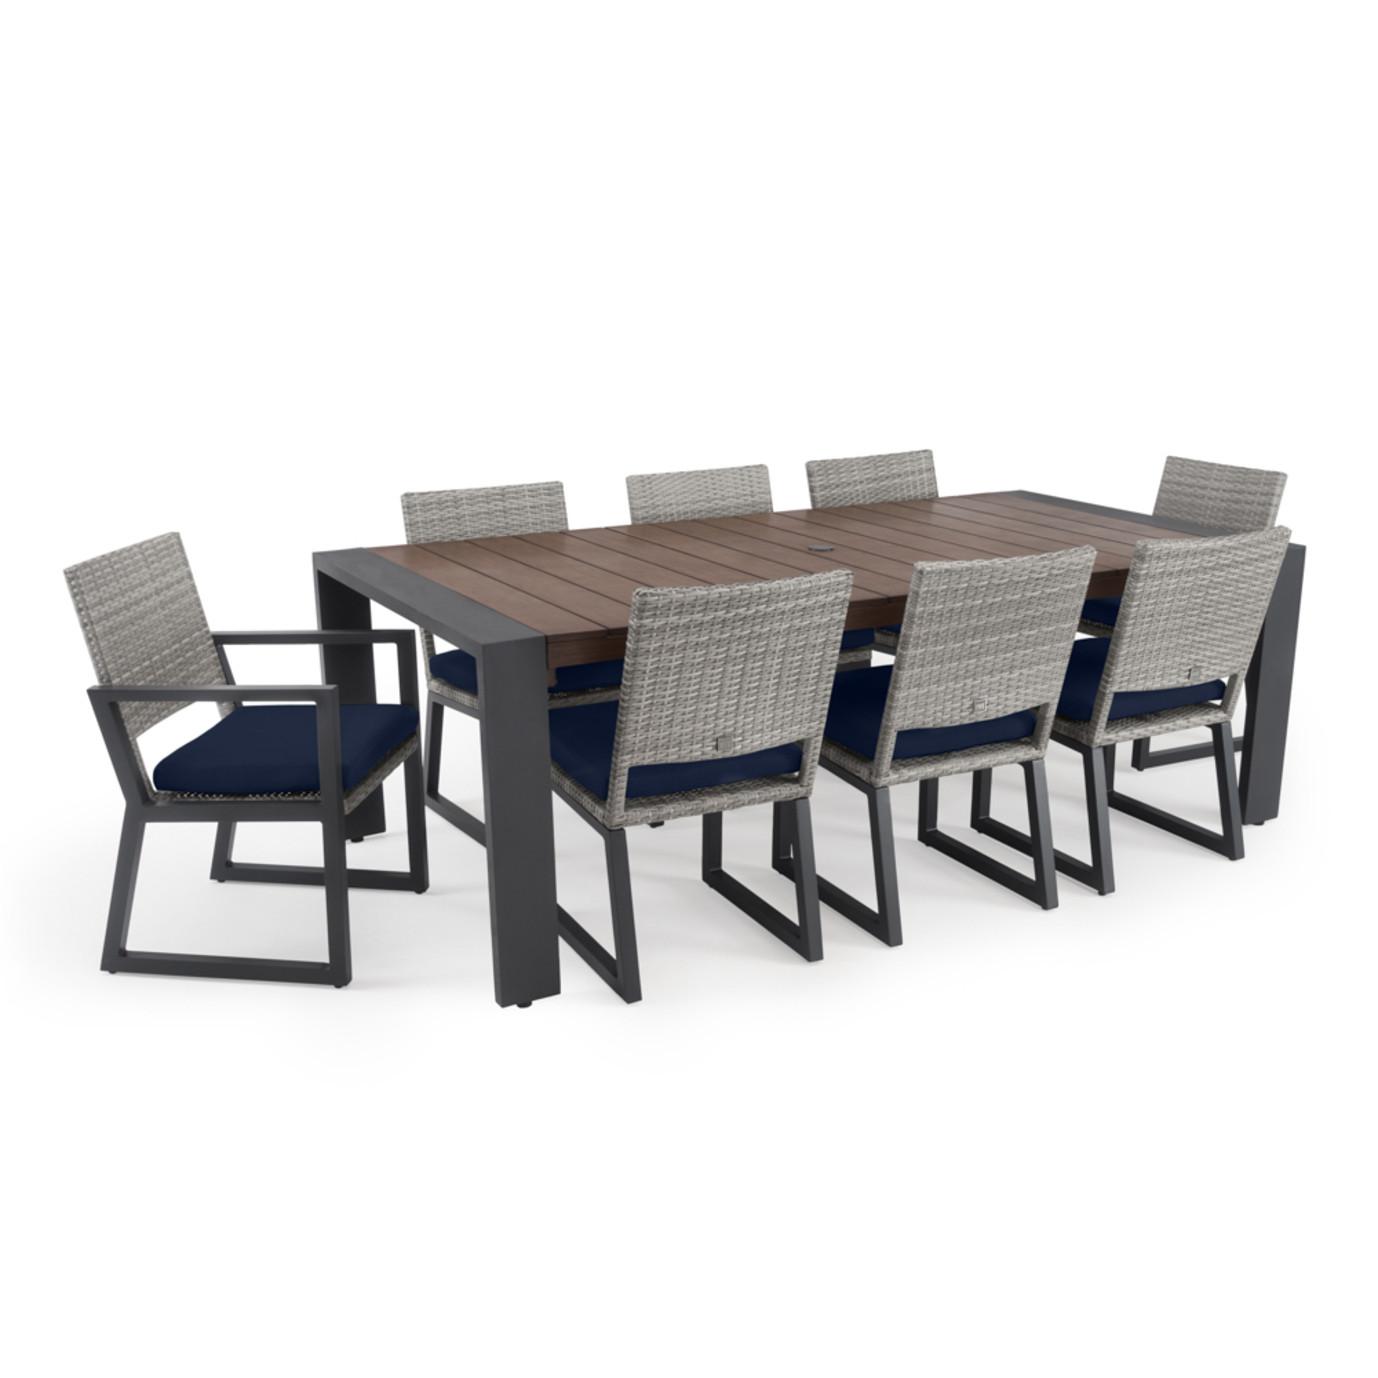 Milo™ Gray 9pc Dining Set - Navy Blue